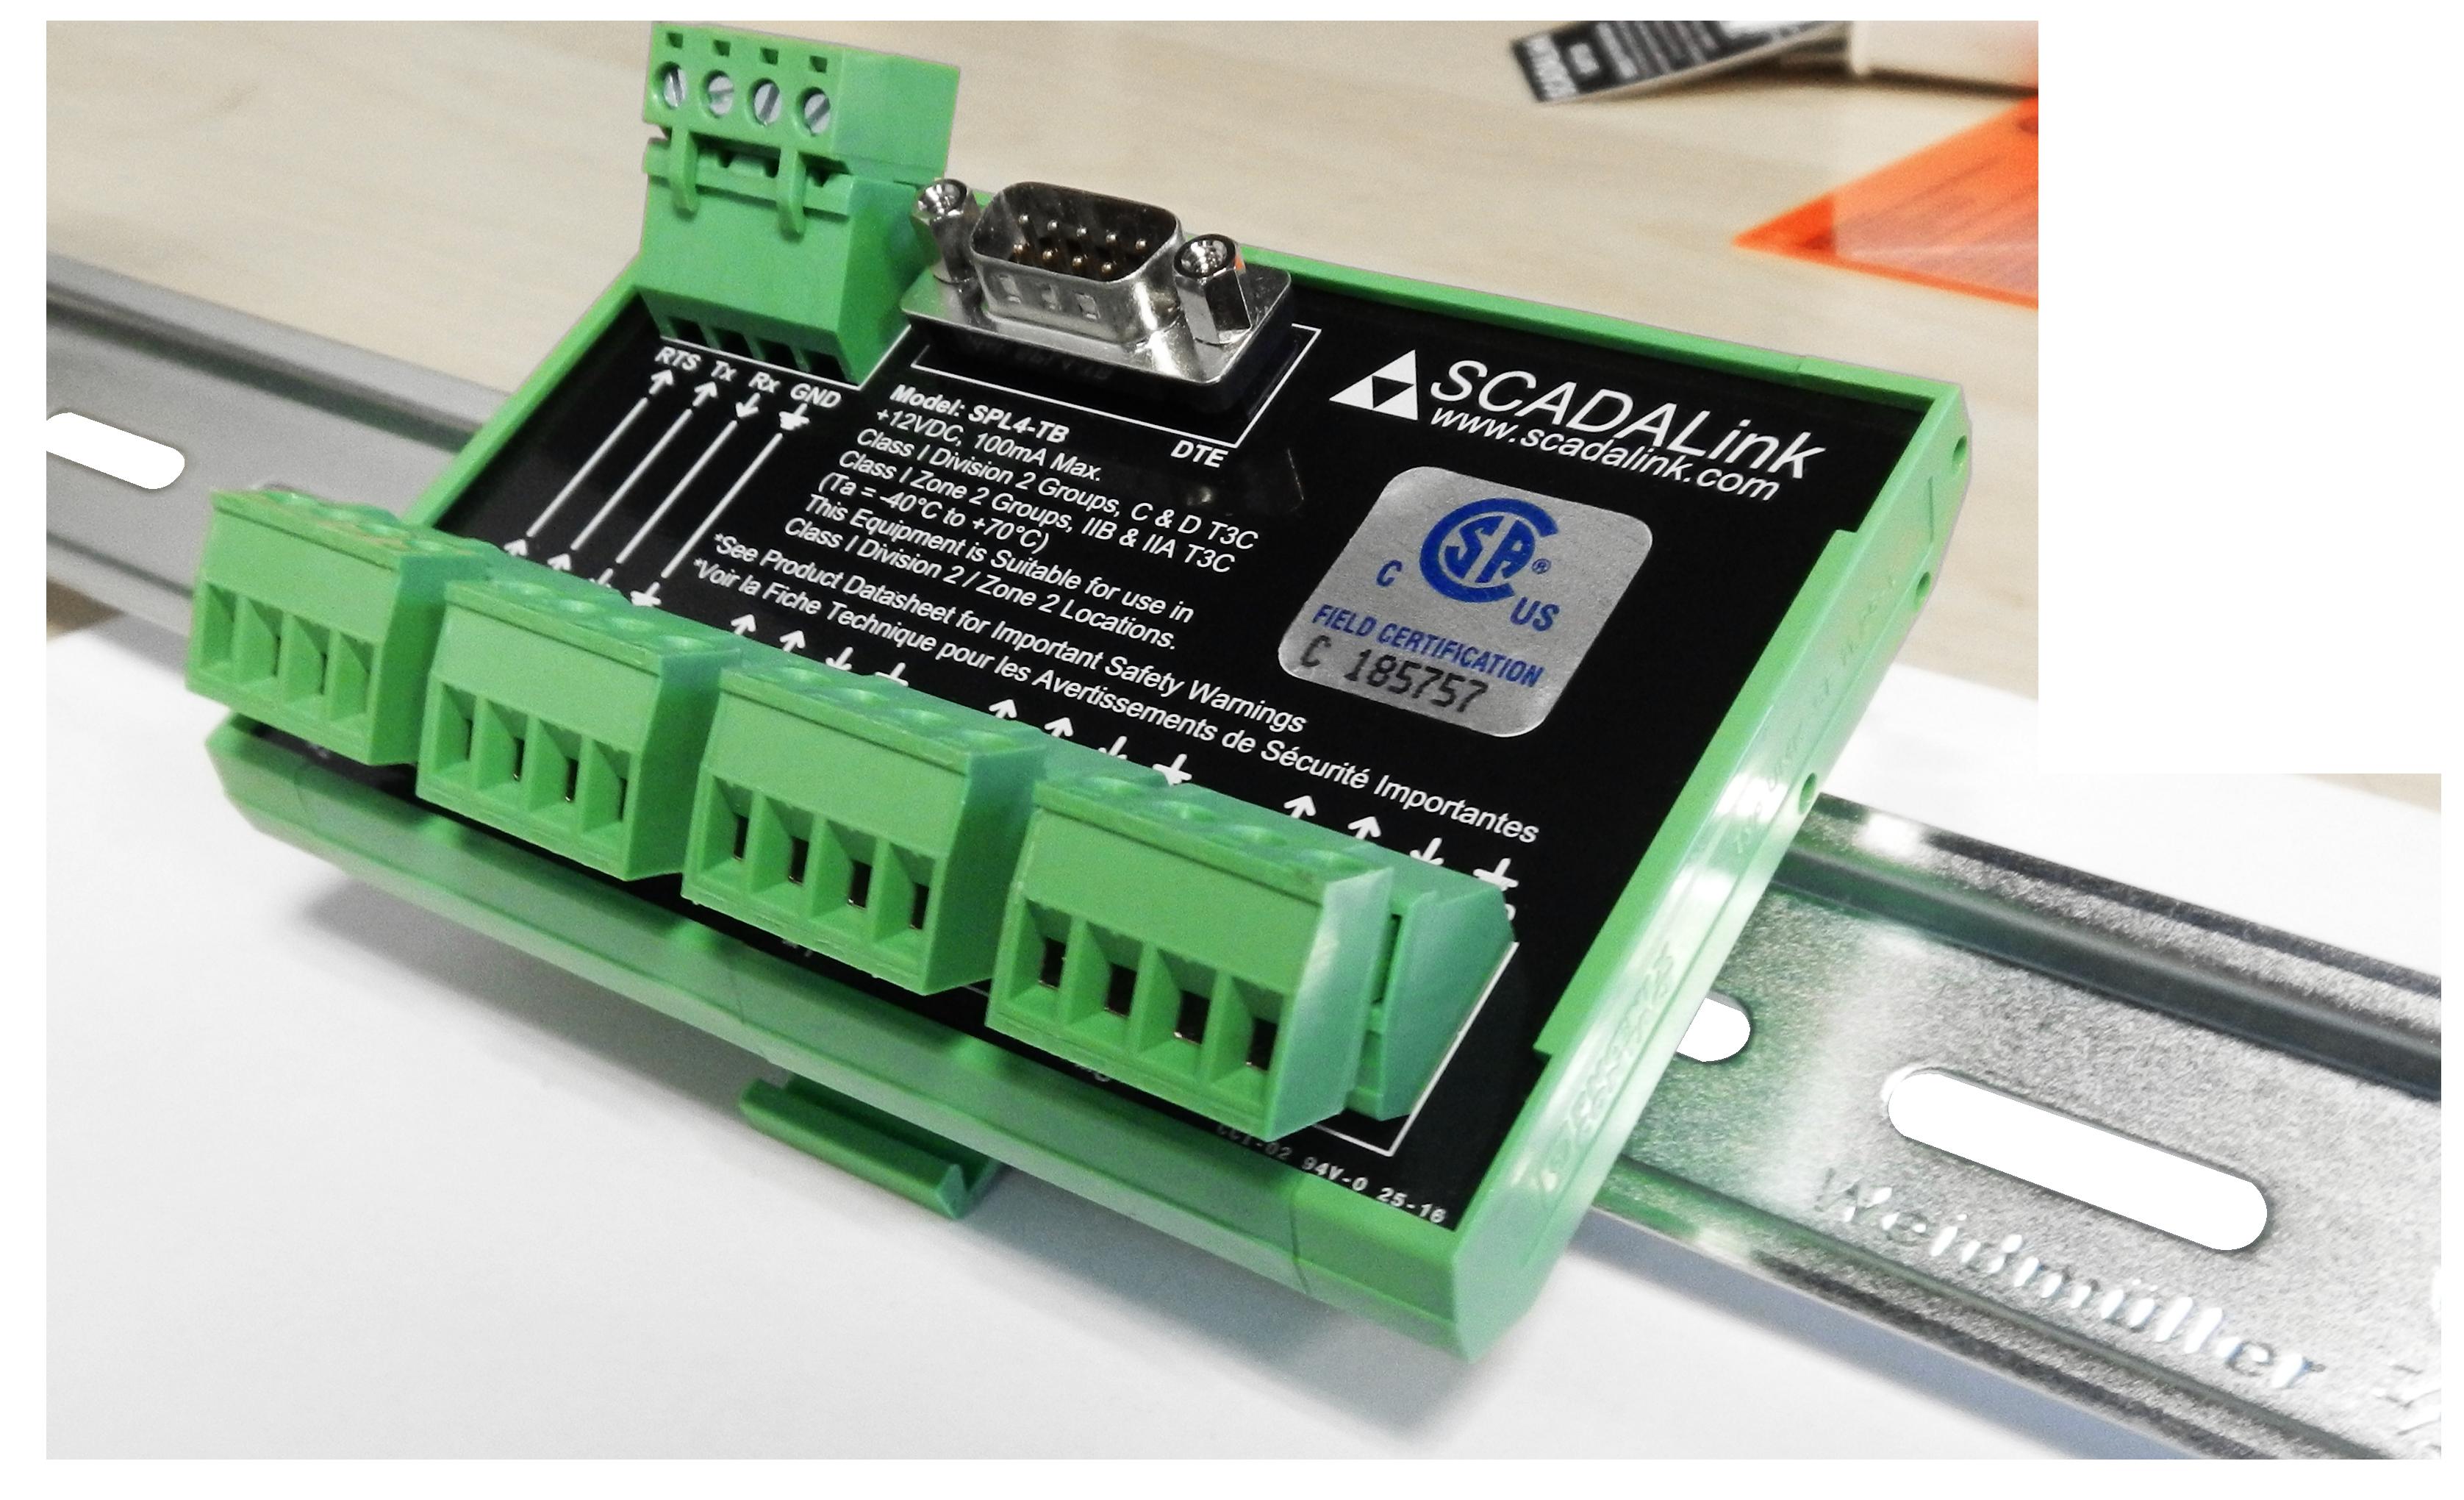 SCADALink SPL4-TB — RS232 Splitter